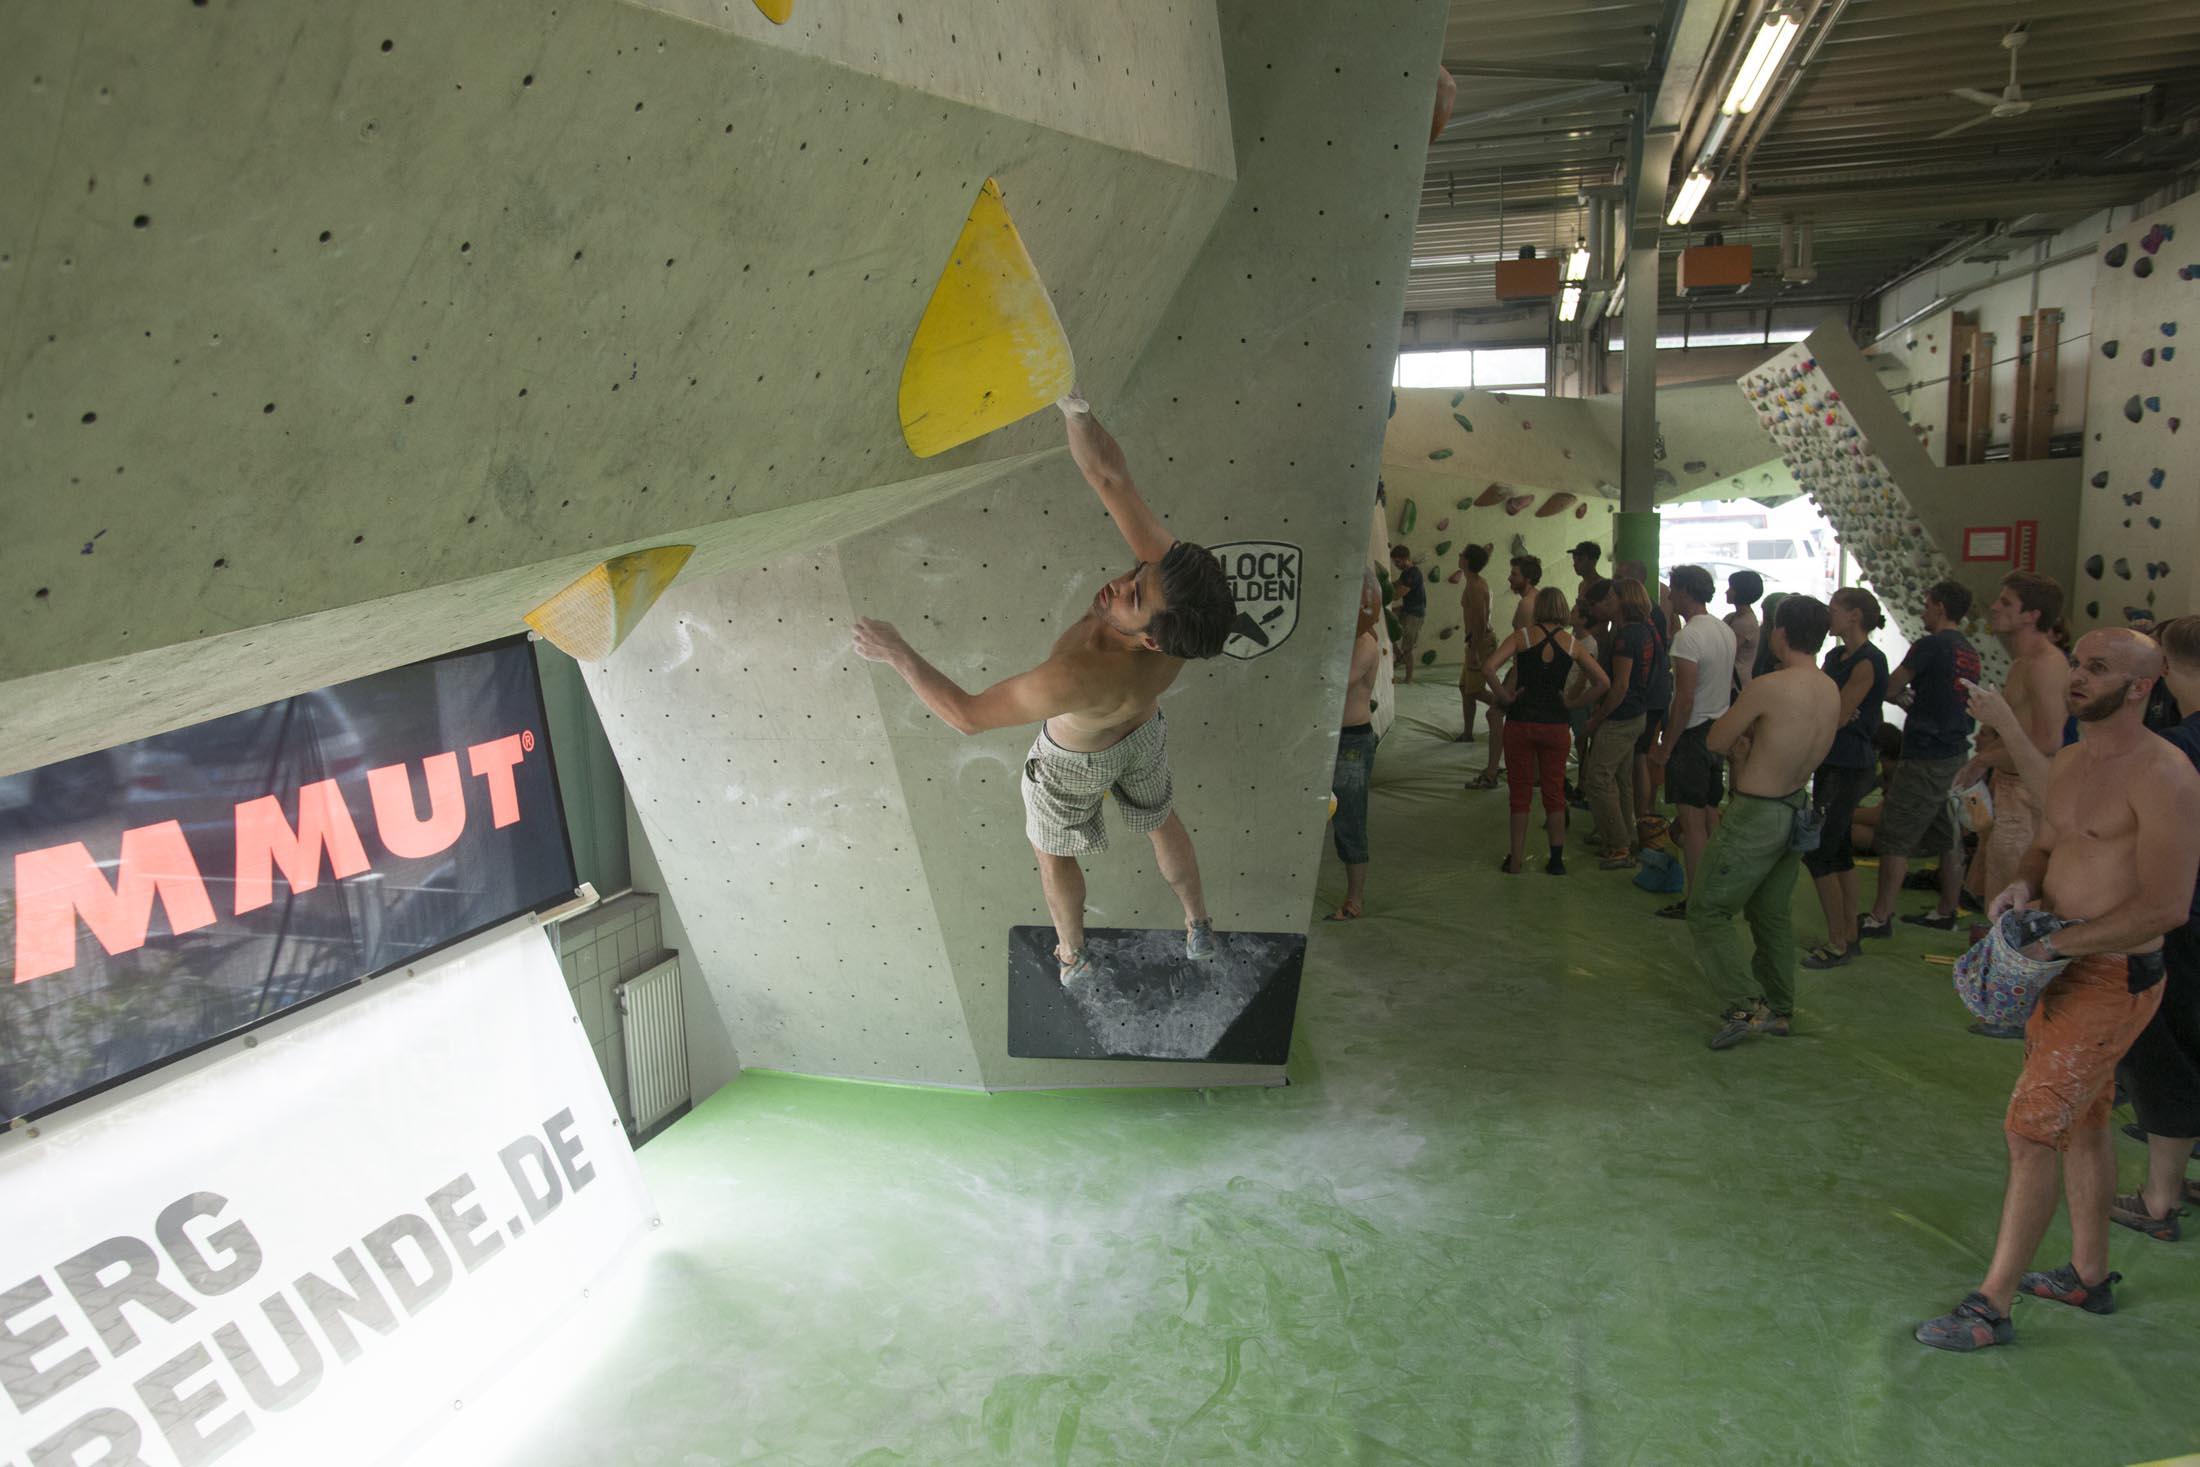 Quali, internationaler bouldercup Frankenjura 2016, BLOCKHELDEN Erlangen, Mammut, Bergfreunde.de, Boulderwettkampf07092016391